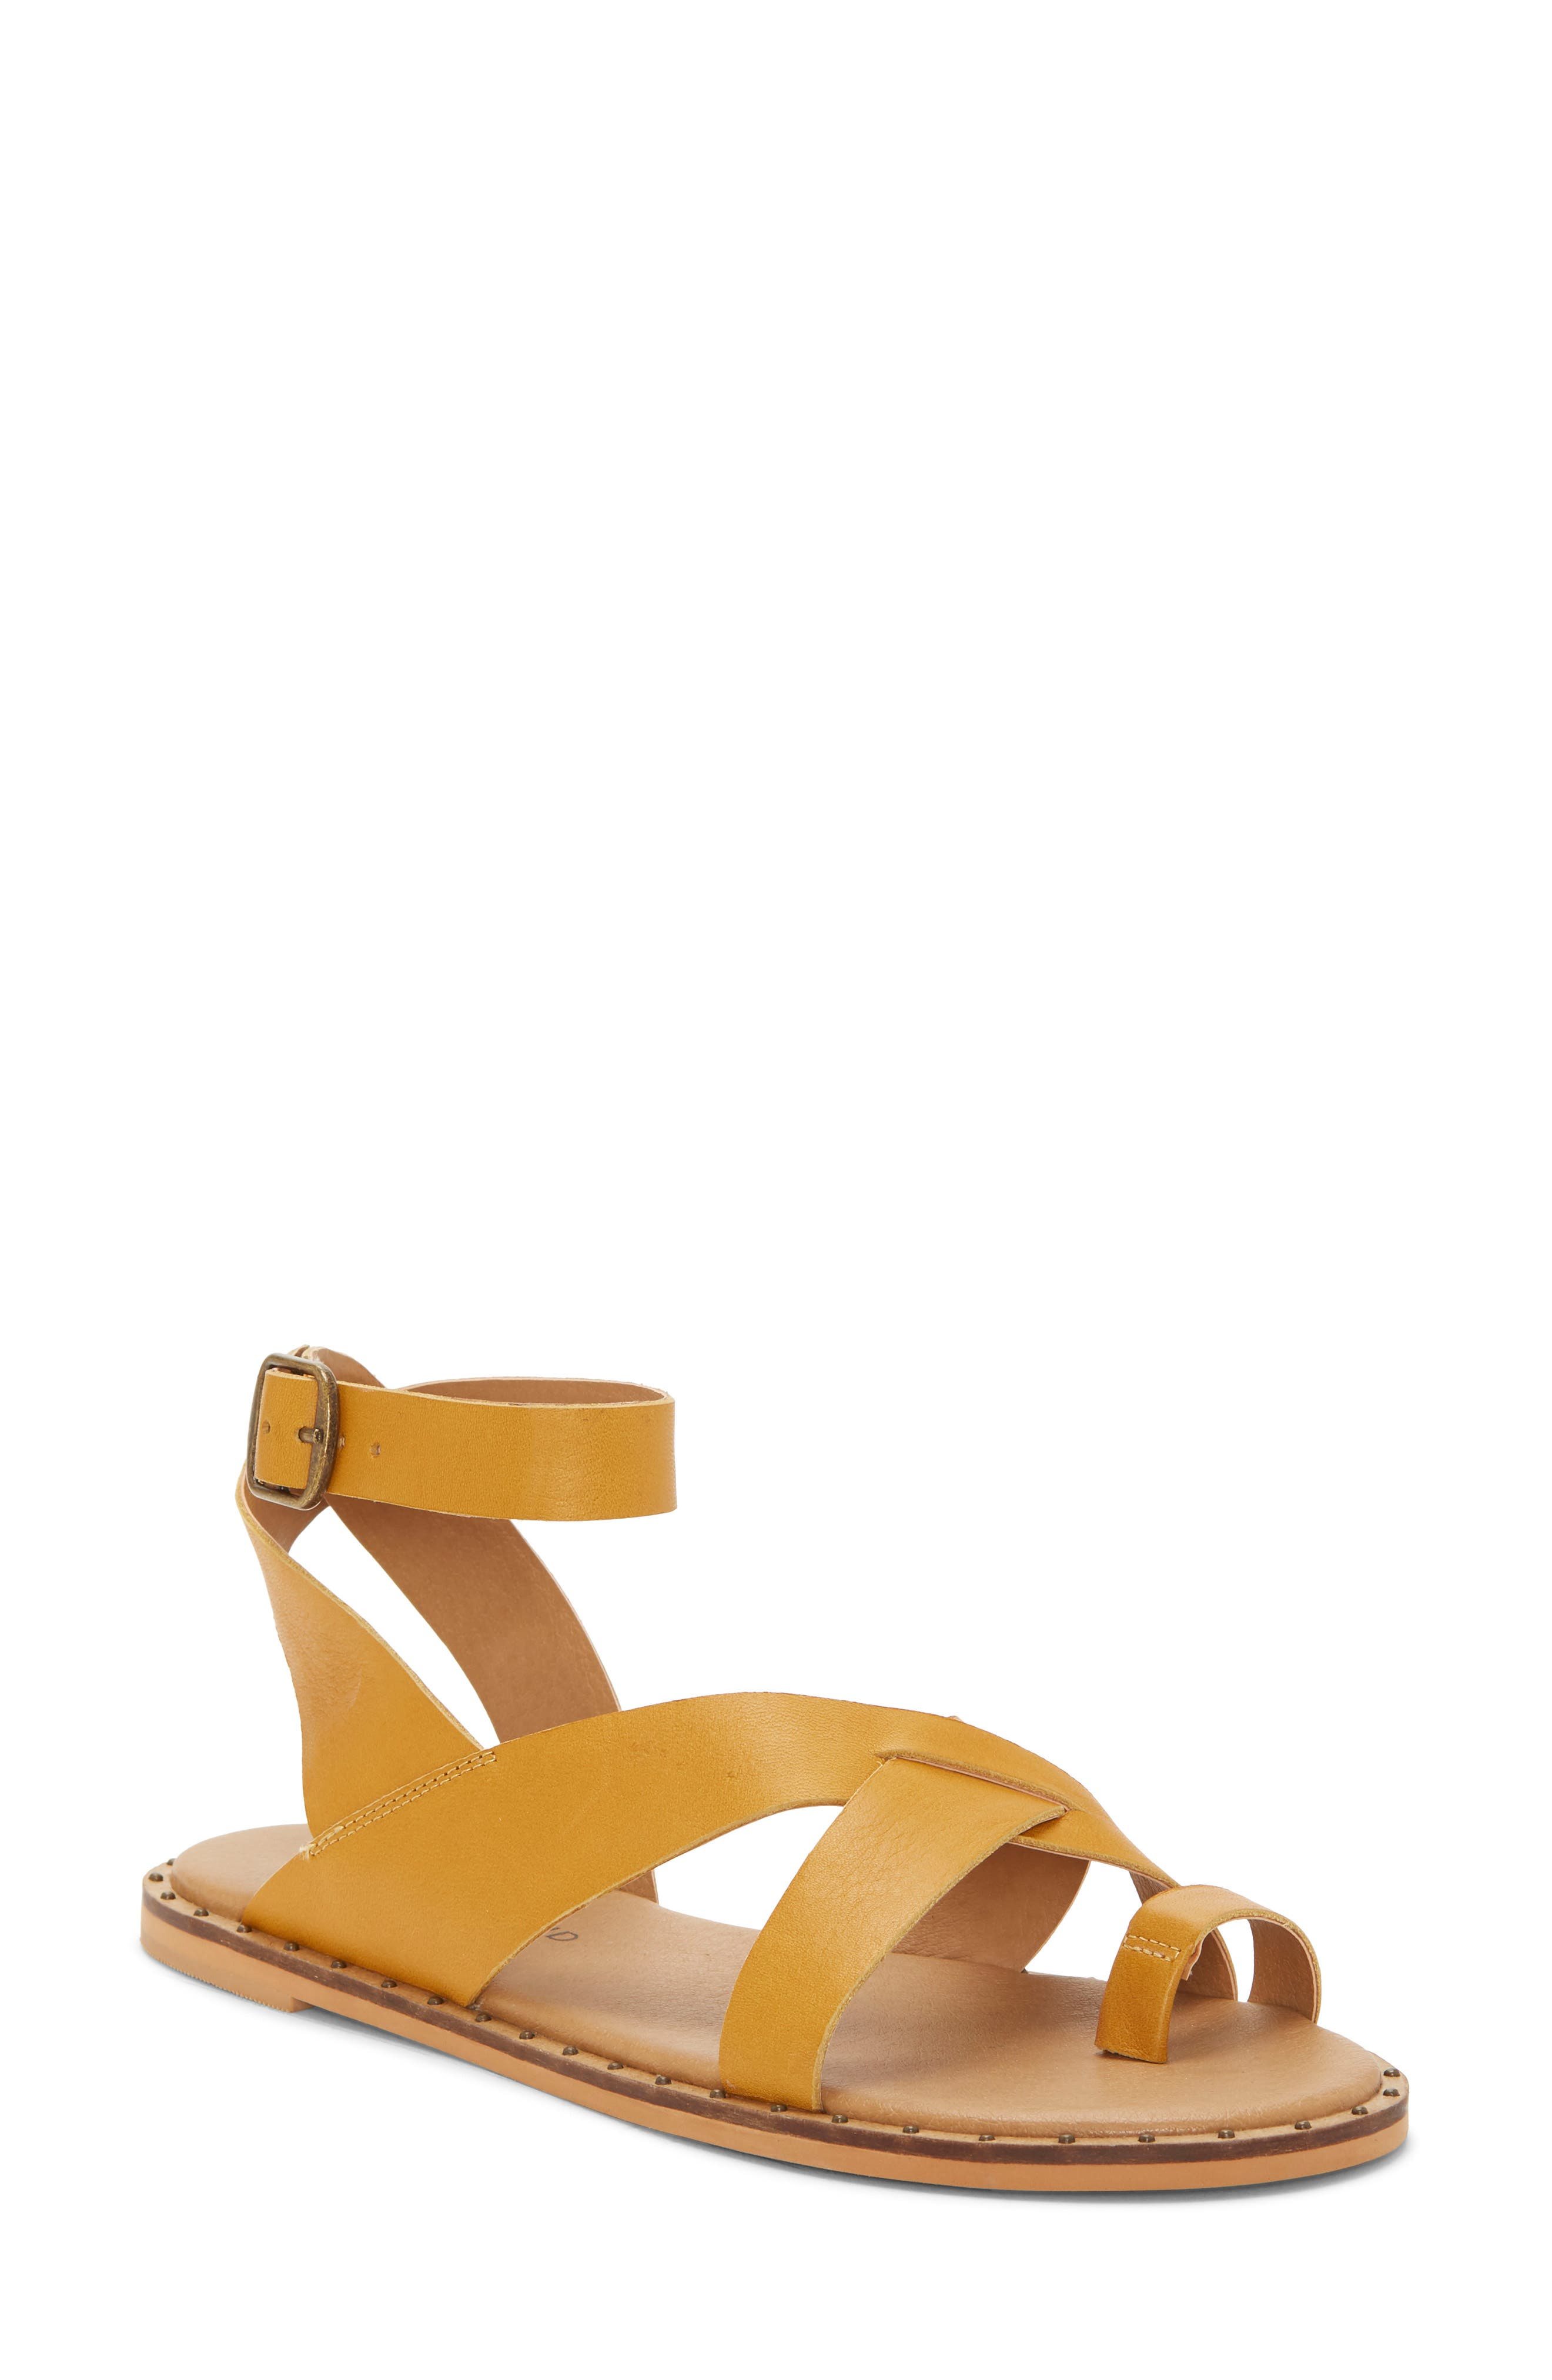 Lucky Brand Farran Toe Loop Sandal, Yellow